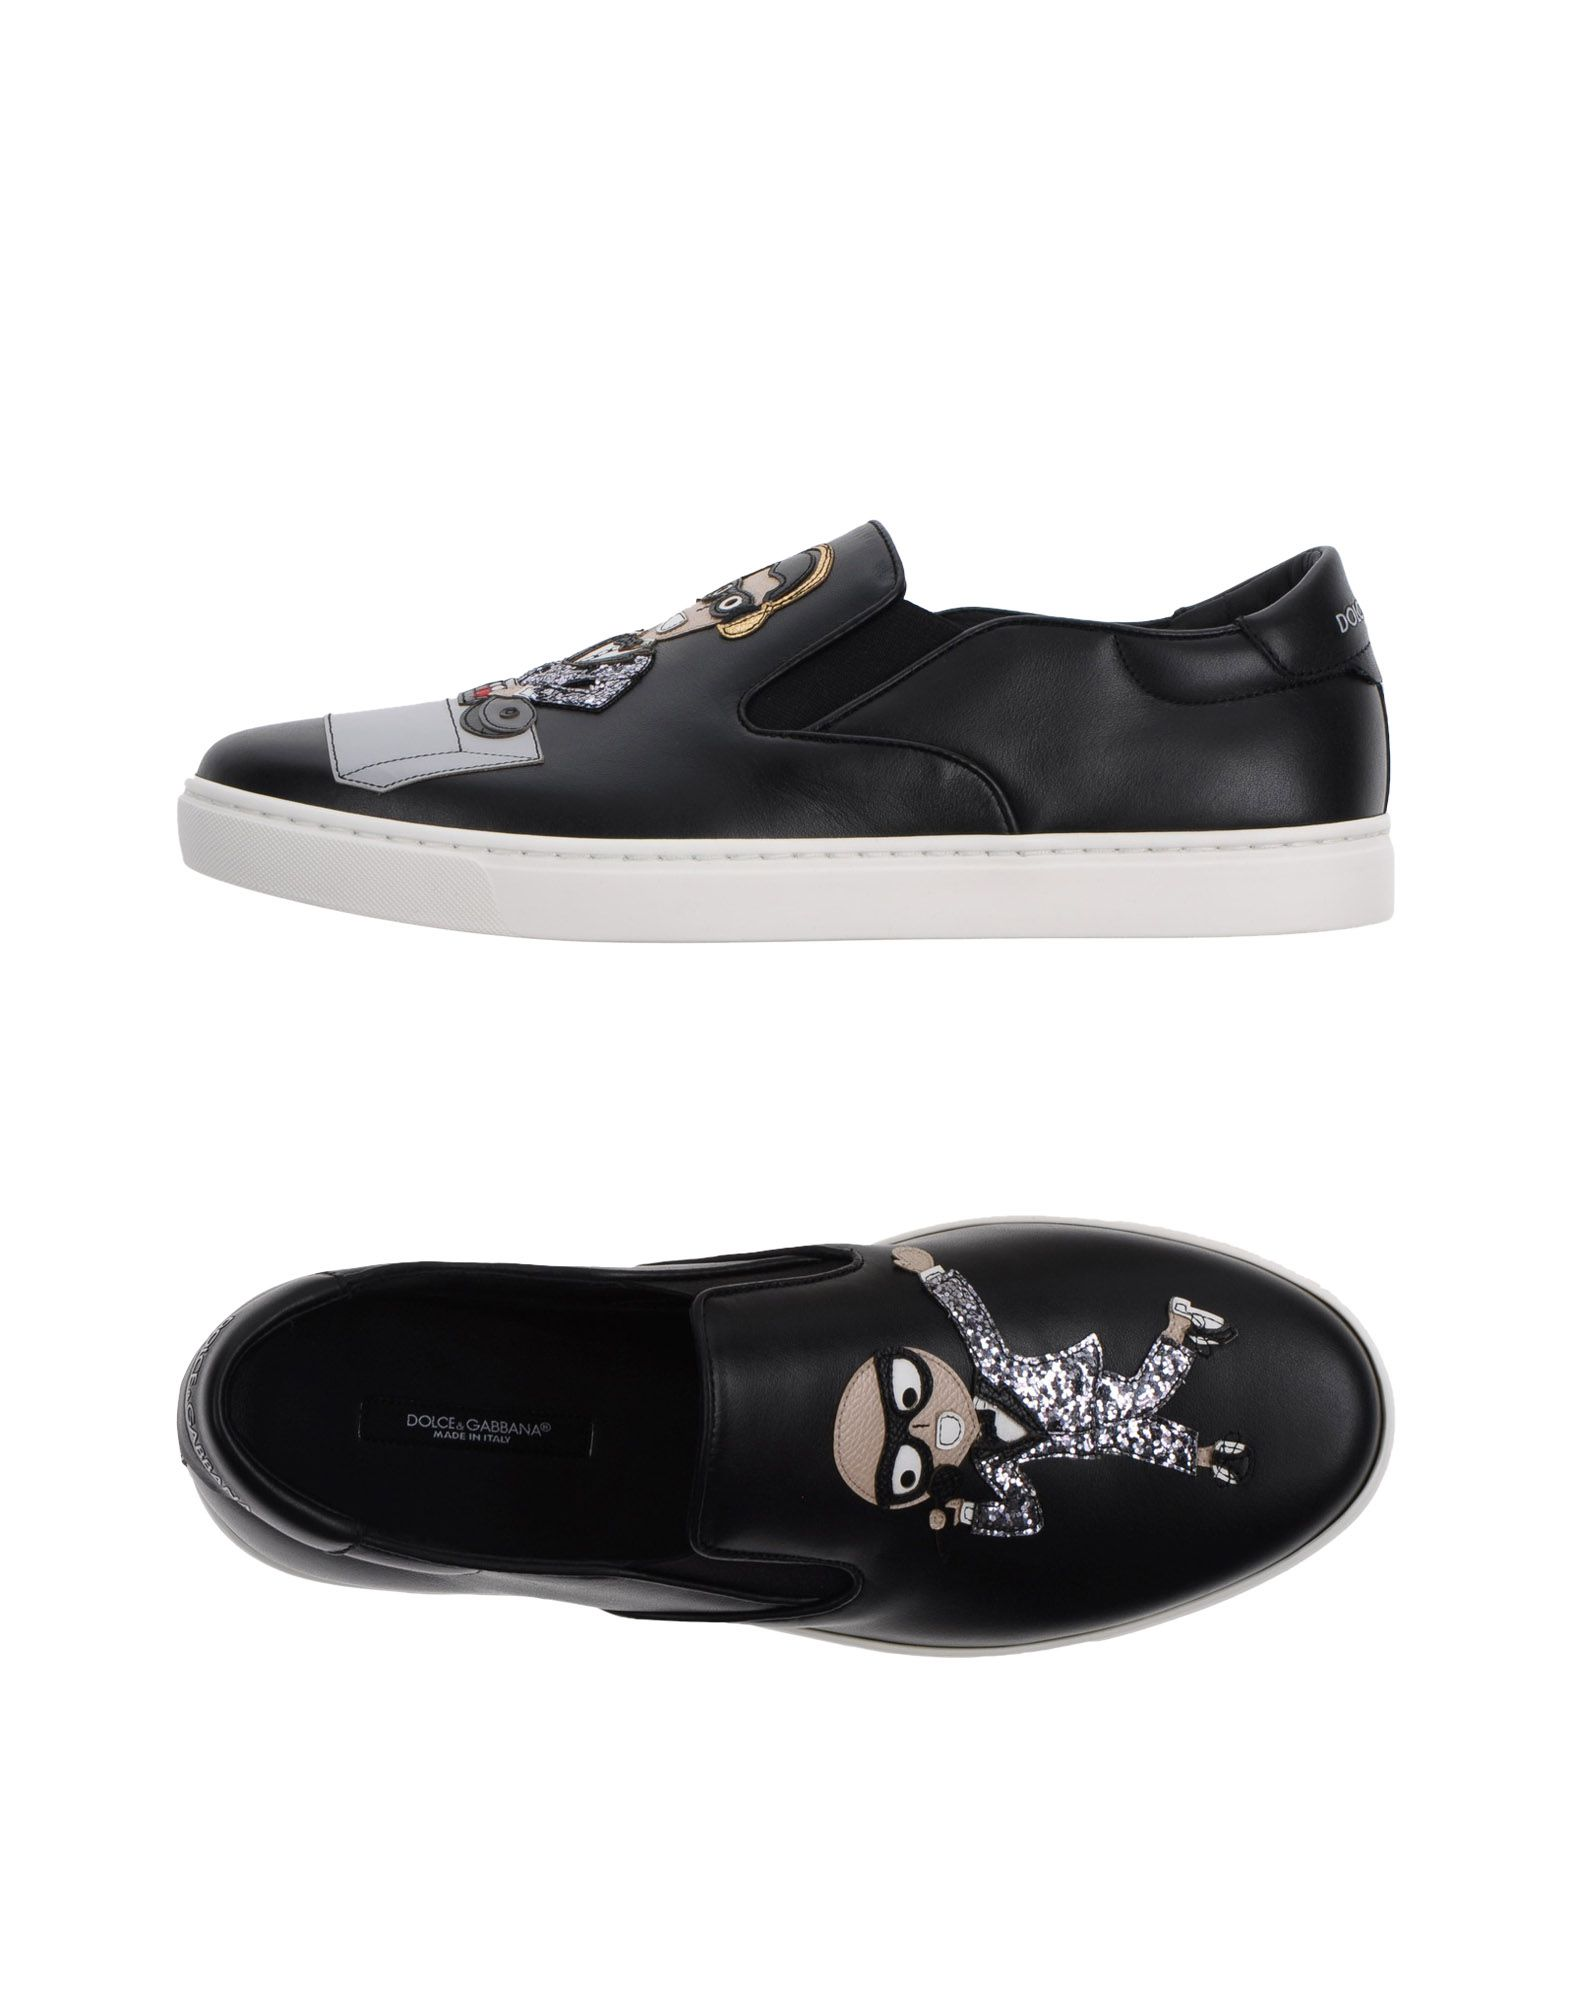 Dolce & Gabbana Sneakers Qualität Herren  11349747EW Gute Qualität Sneakers beliebte Schuhe 7550cc